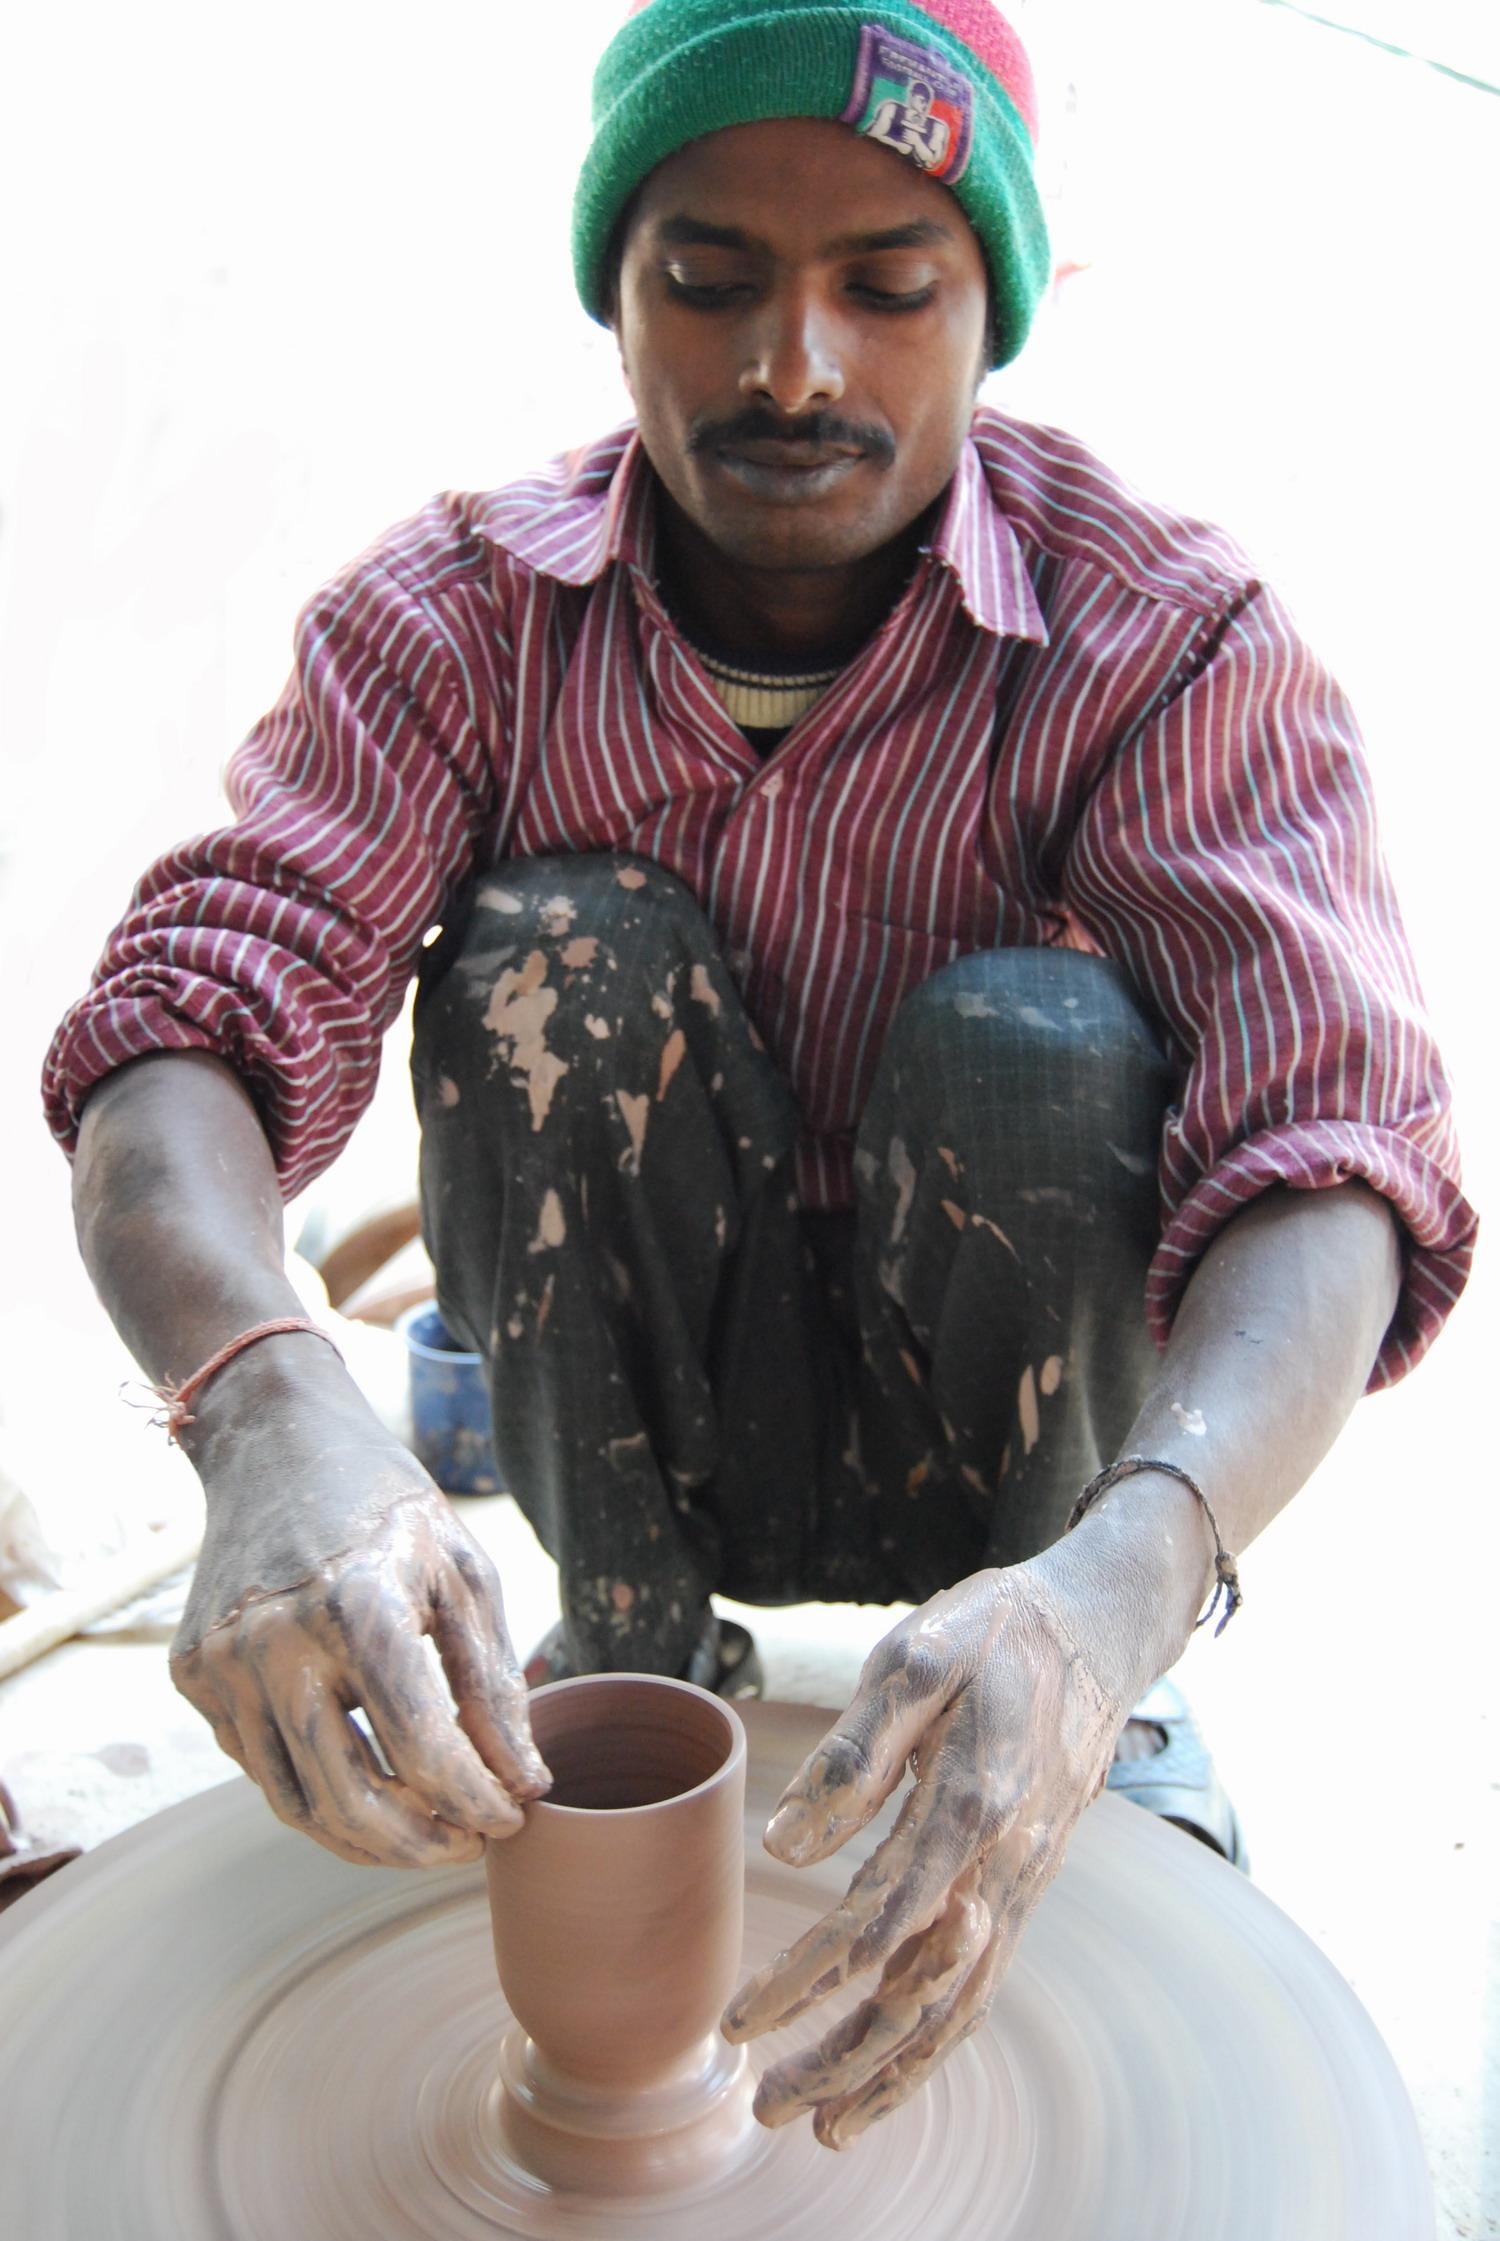 Banay Singh making beakers.